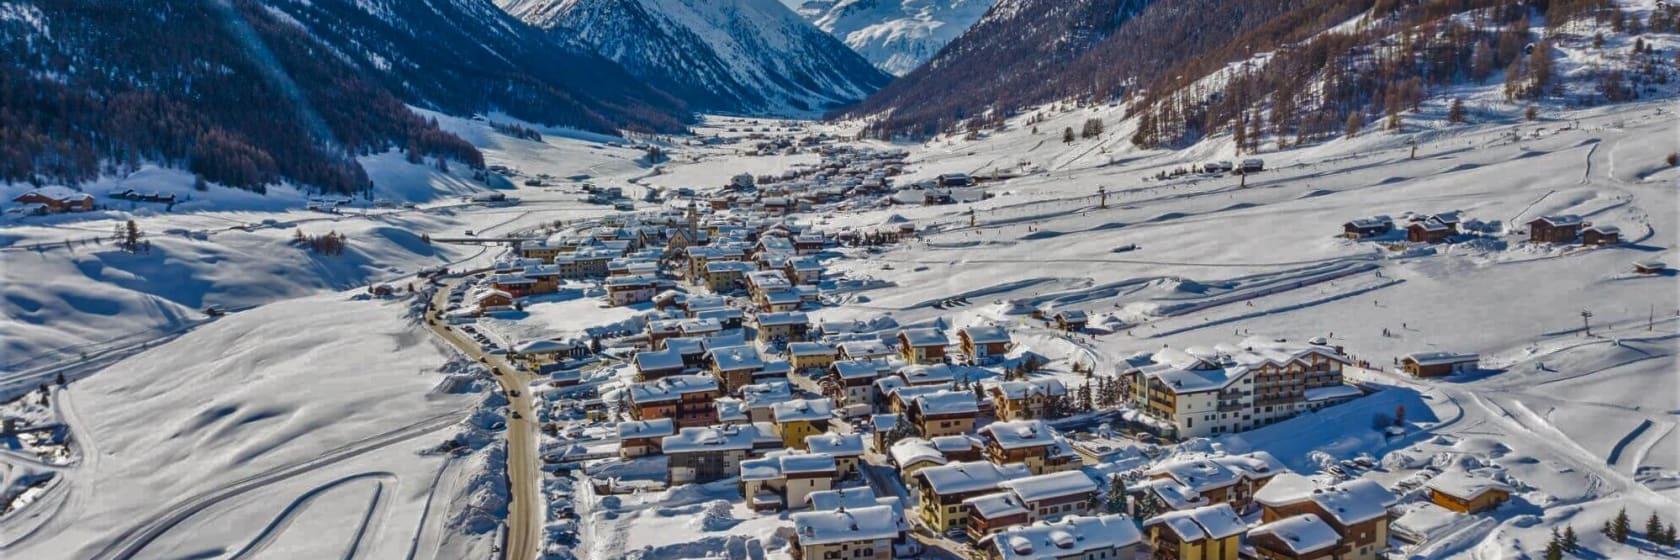 Skihytter i bjergene med sne på tagene i Livigno